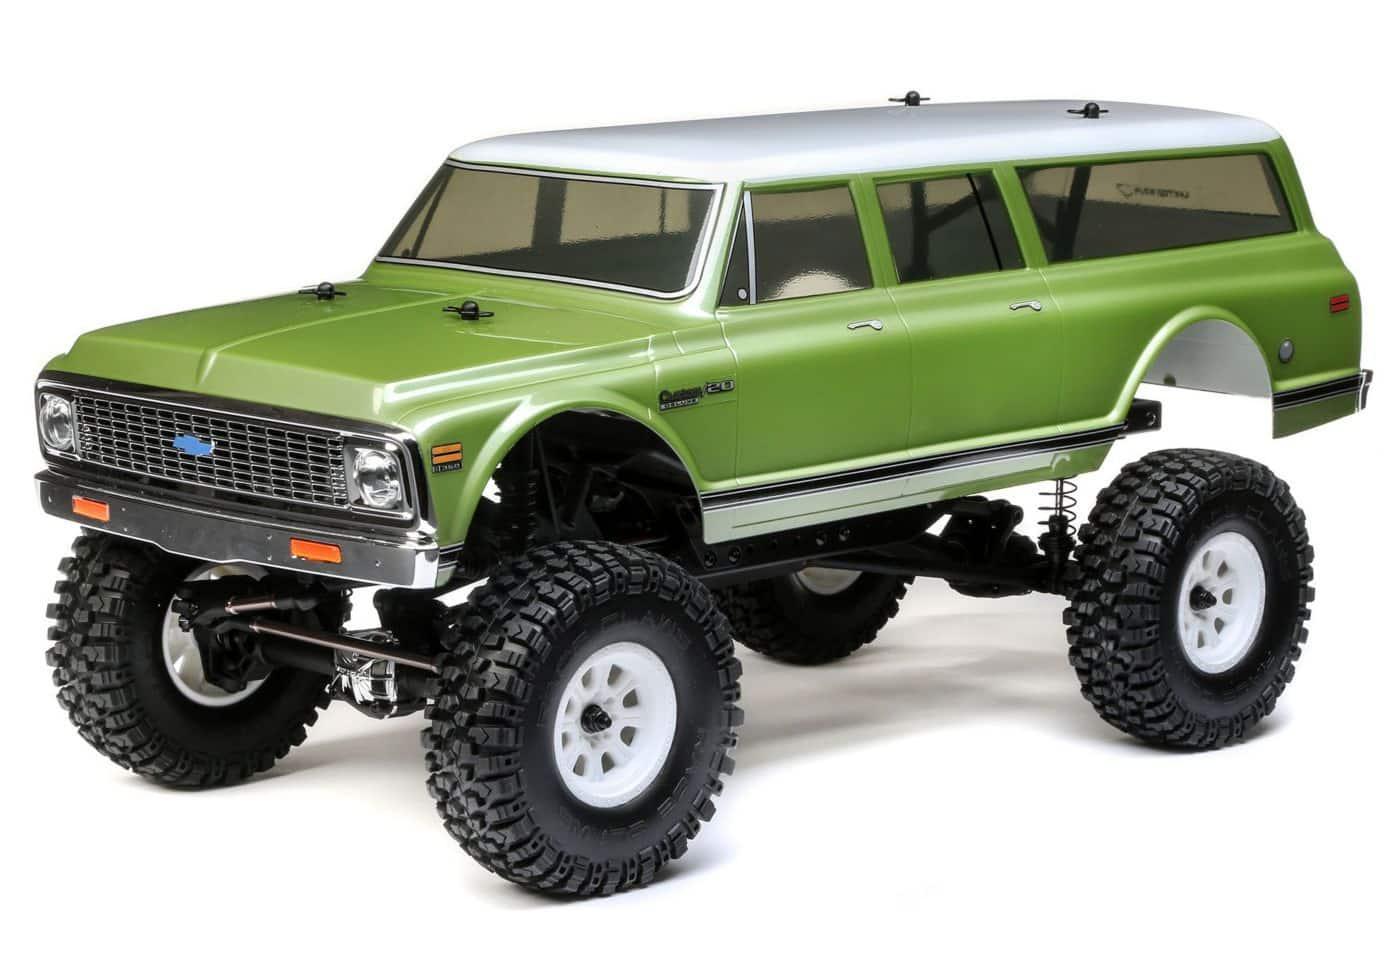 A Budget Brute: Vaterra's 1972 Chevy Suburban Ascender-S